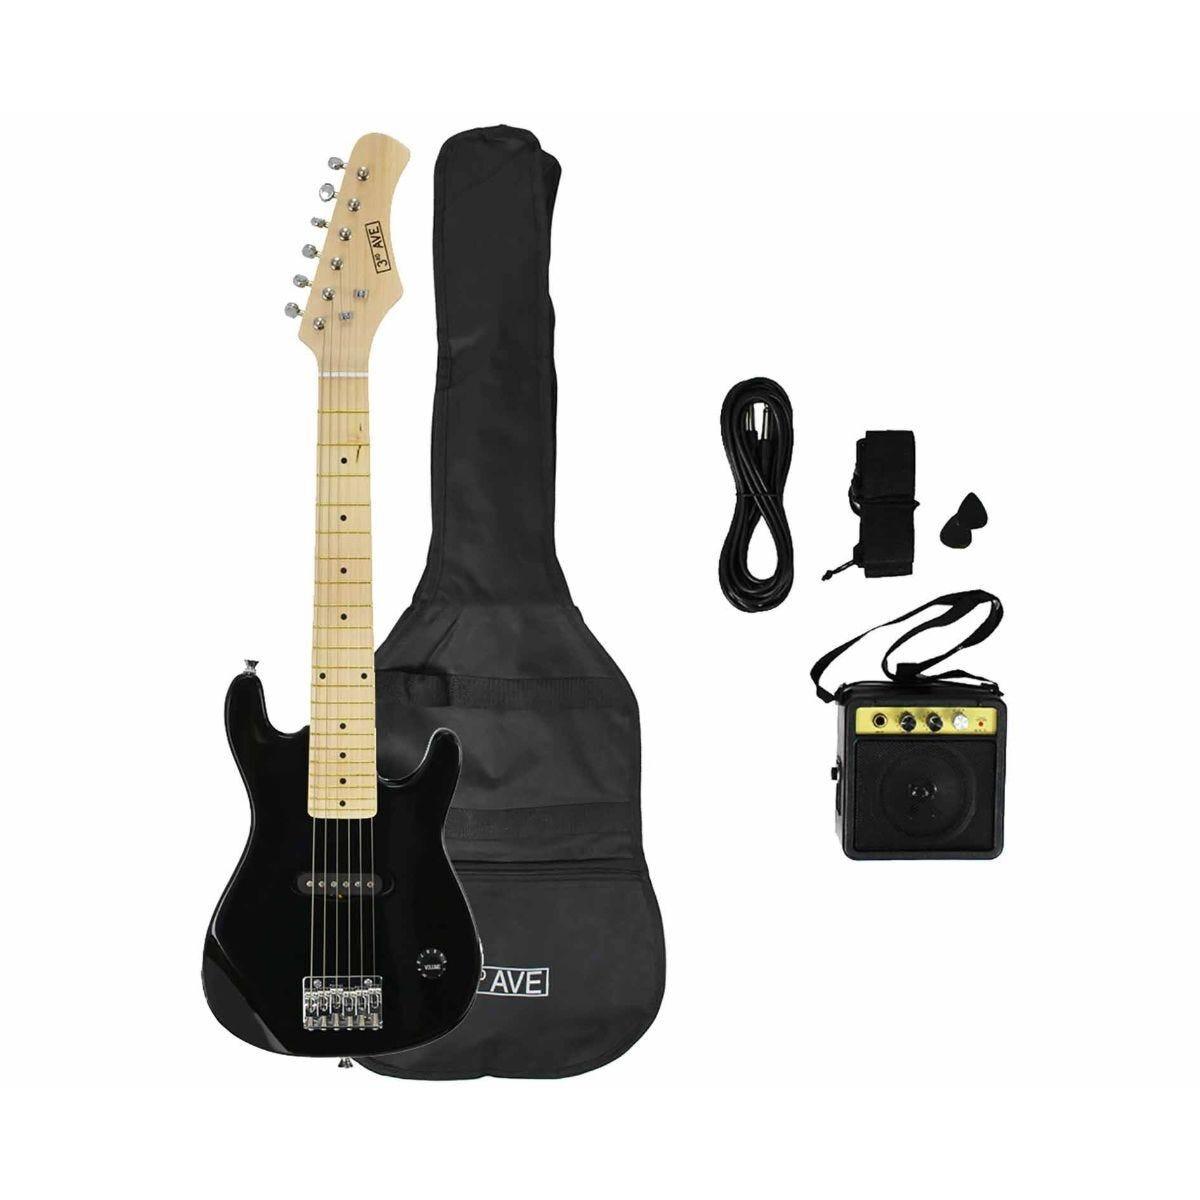 3rd Avenue Junior Electric Guitar Pack